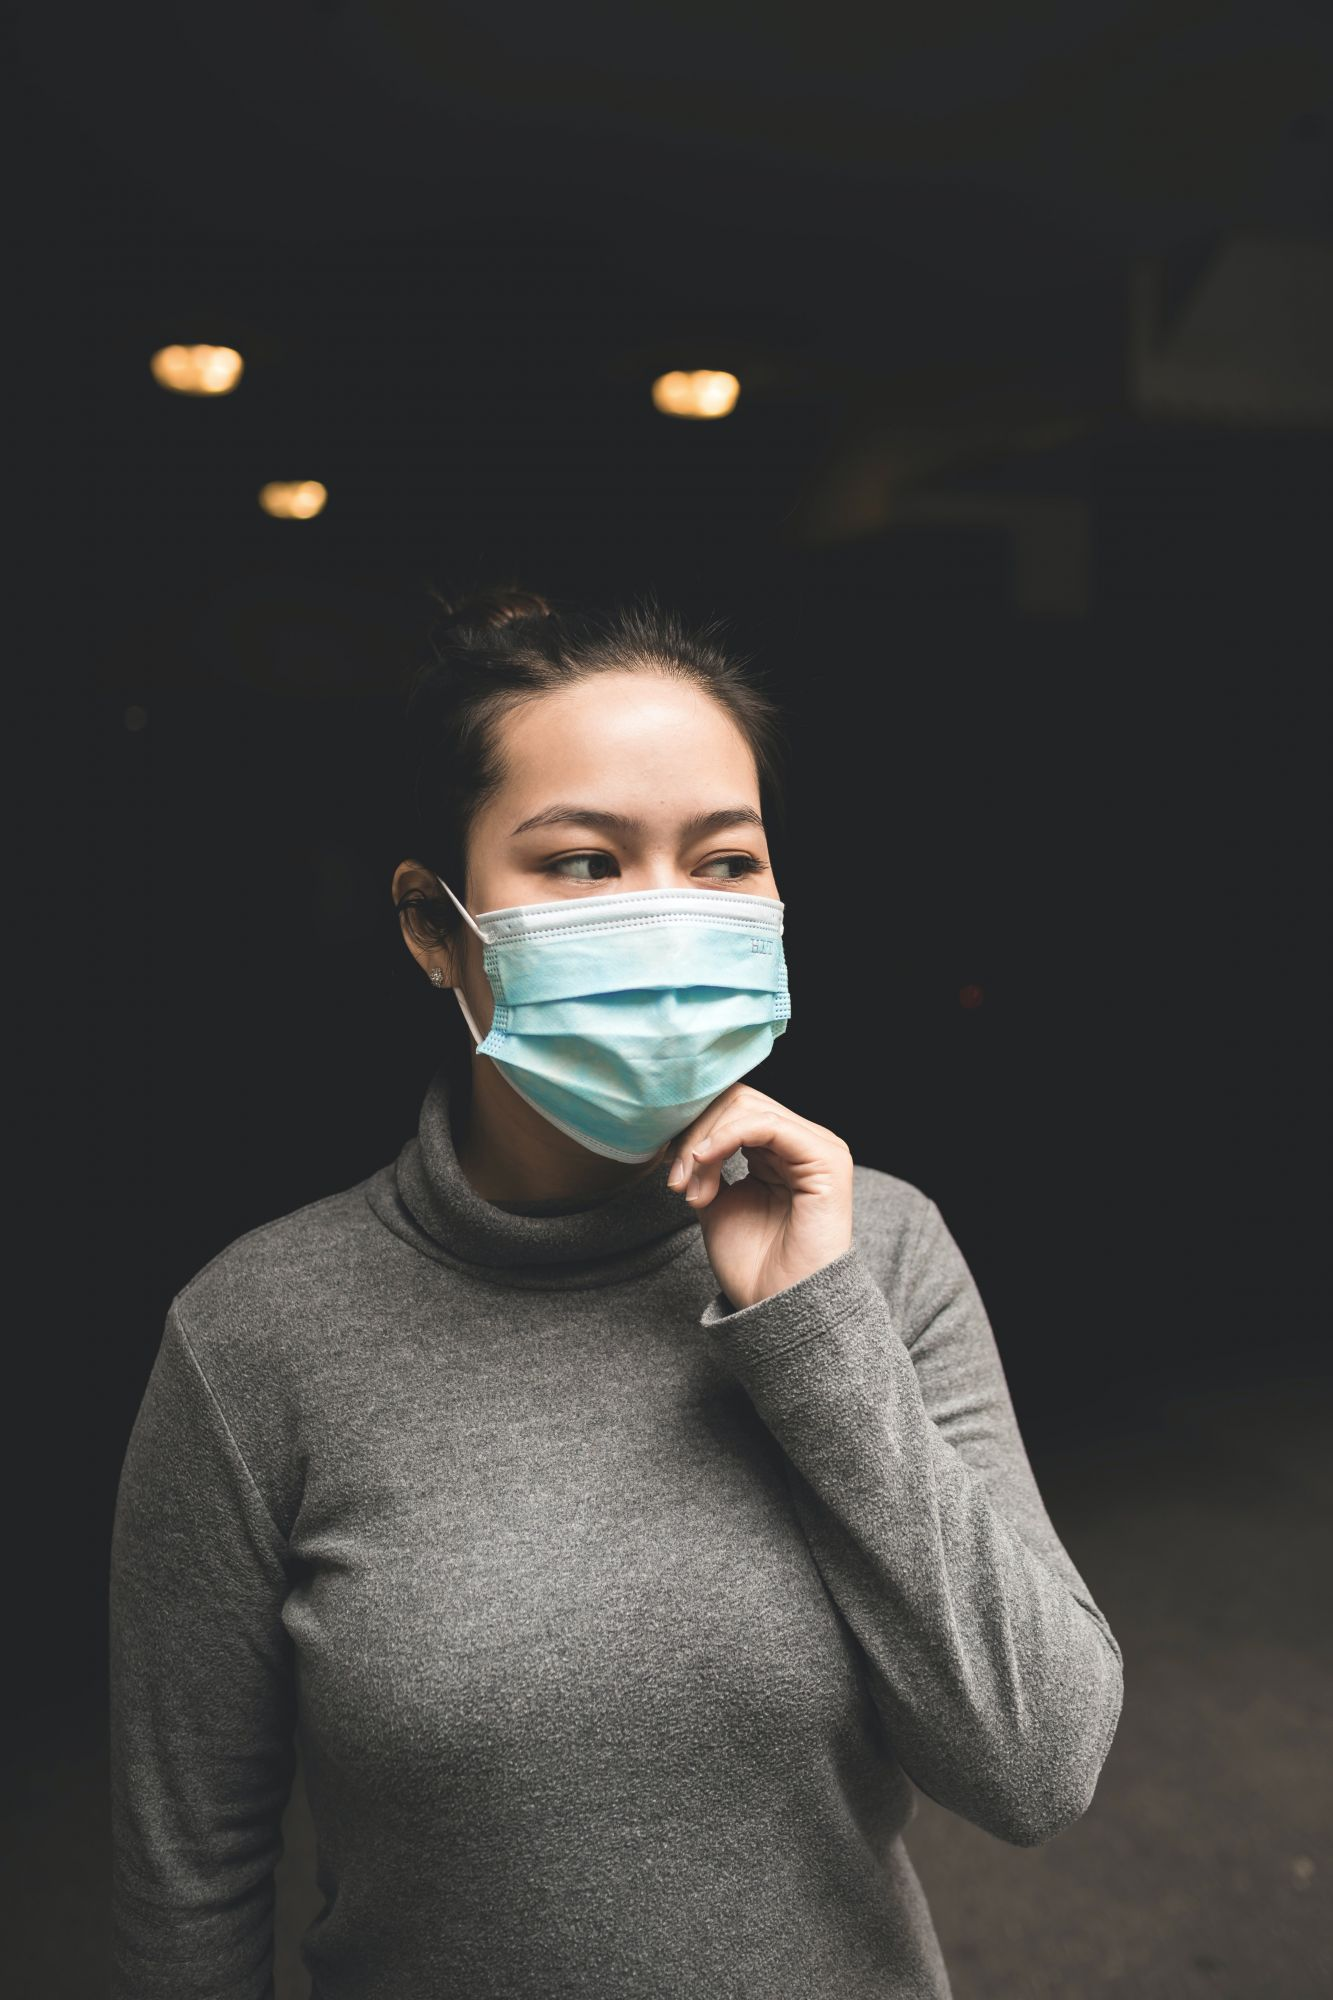 A Dermatologist Shares The Best Face Mask Tips For Sensitive Skin